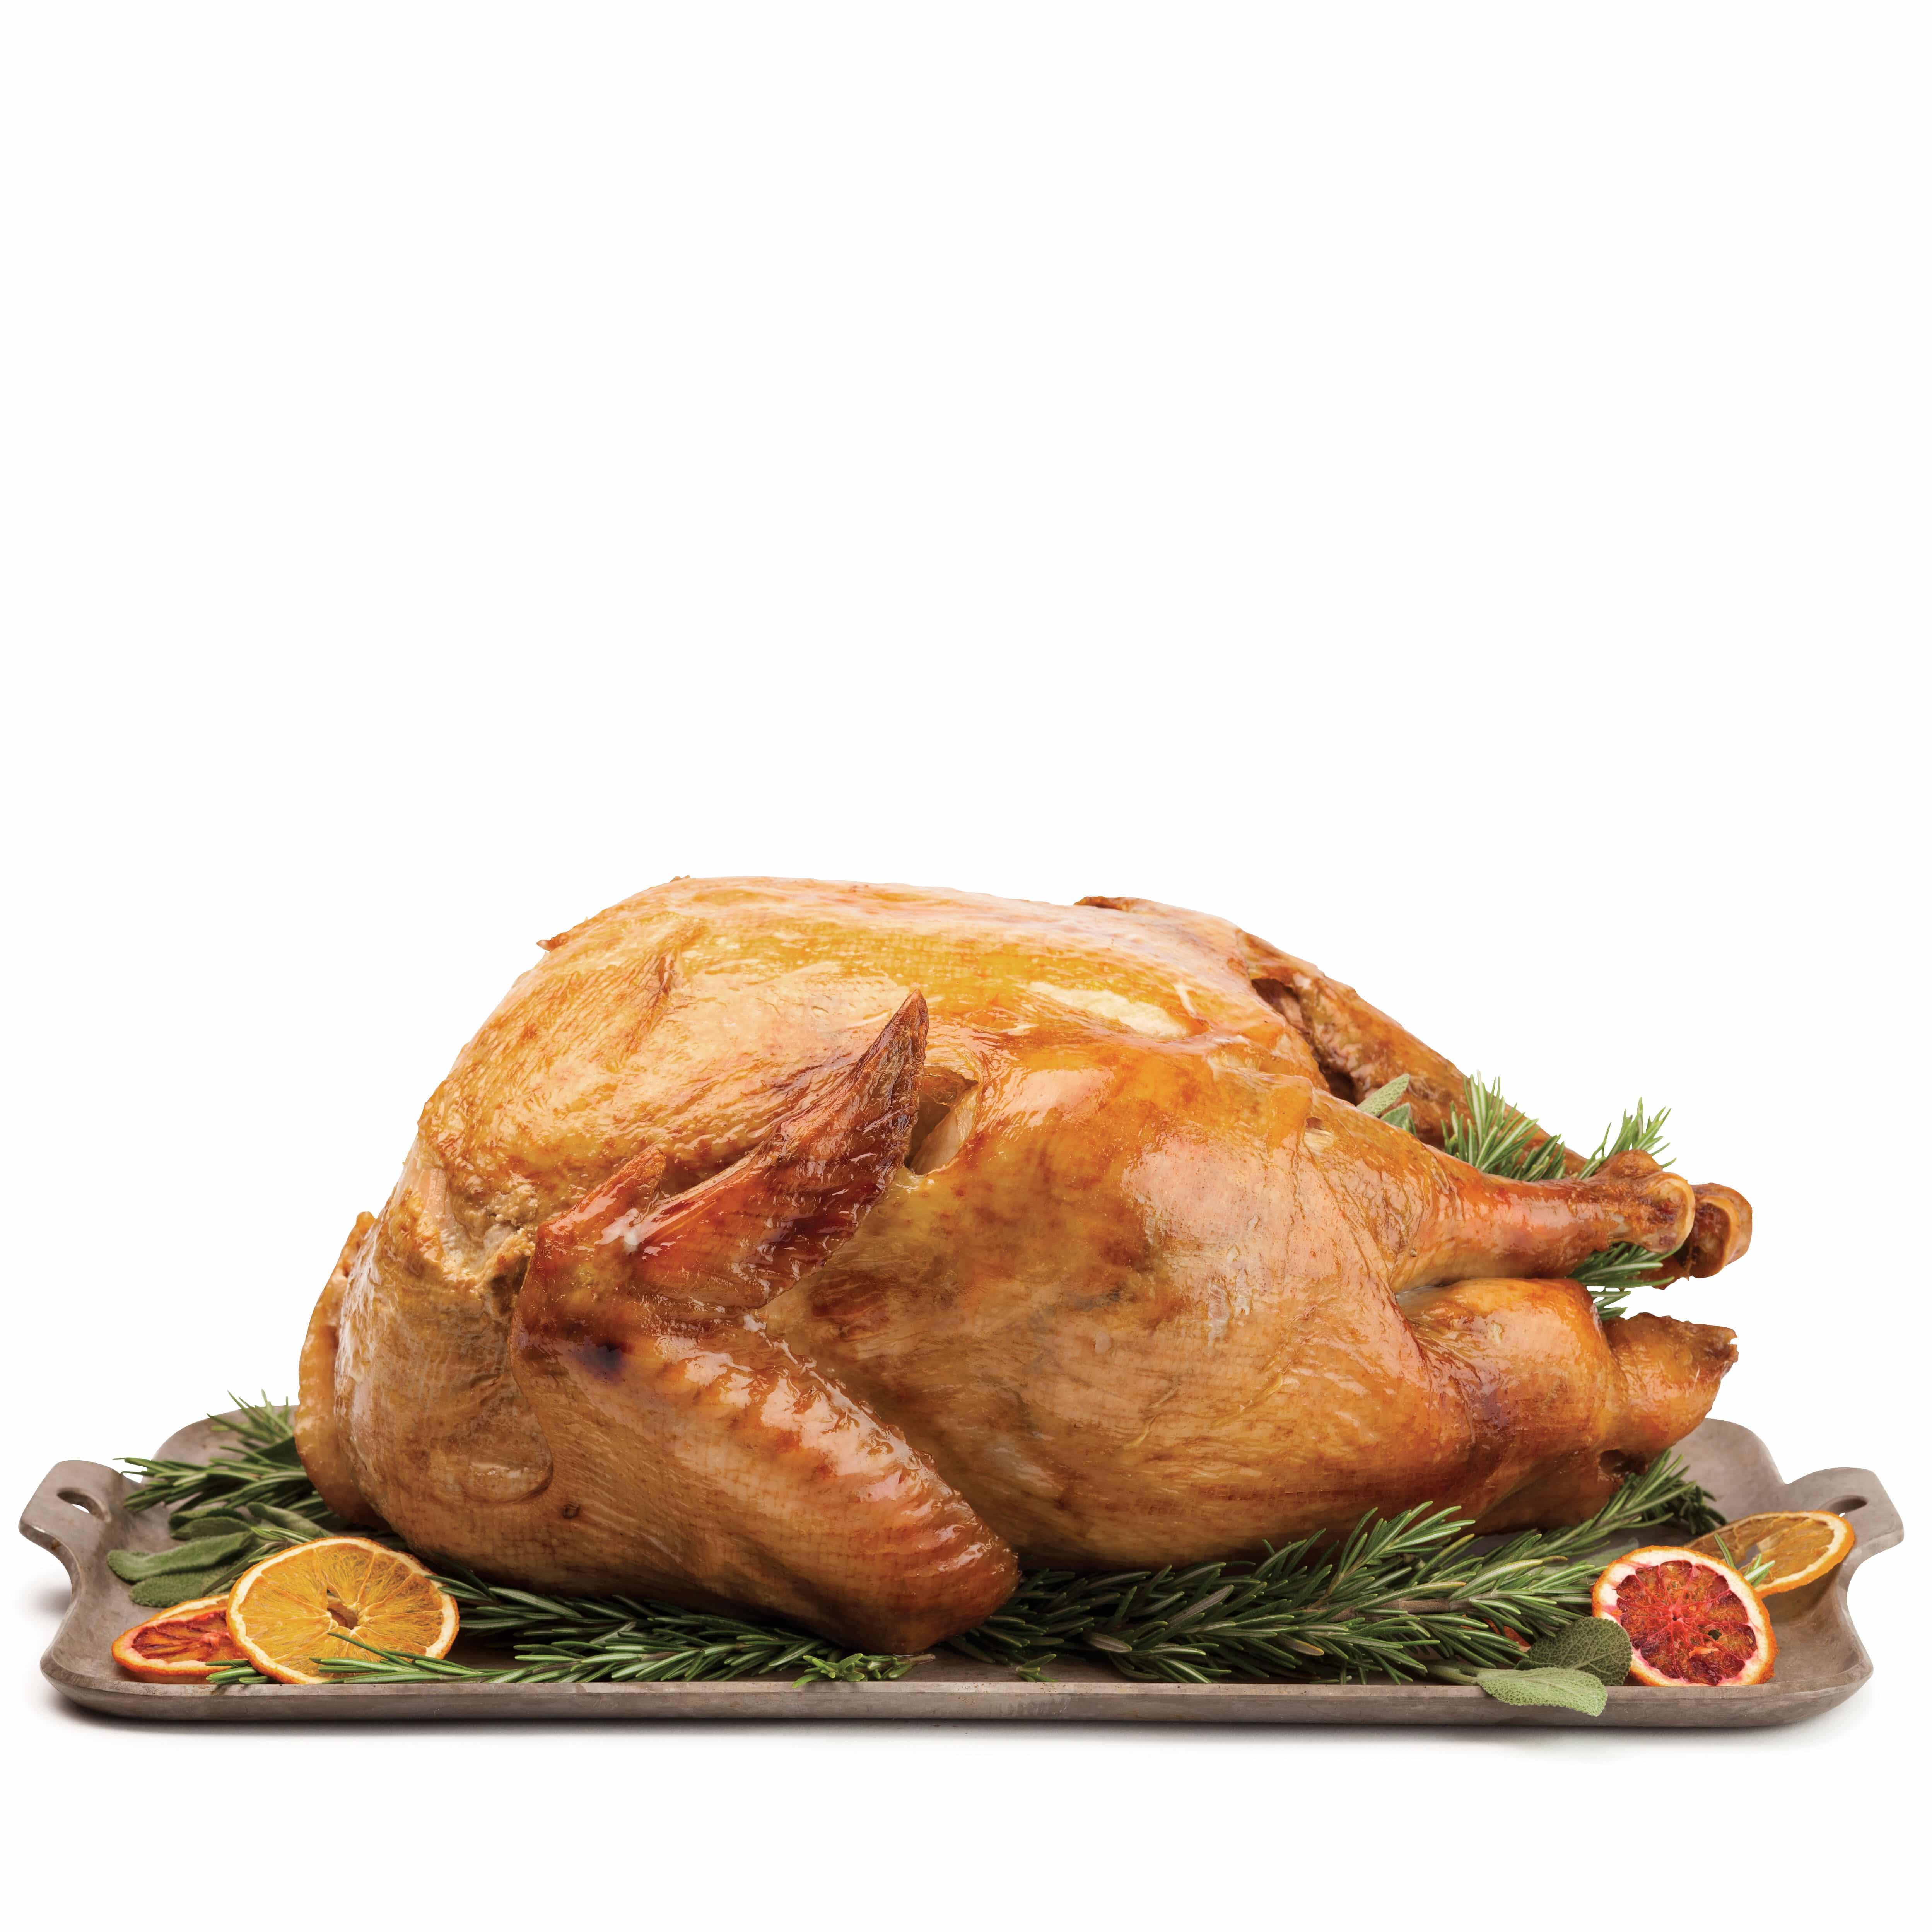 Precooked Thanksgiving Turkey  Cheatsgiving How To Order Thanksgiving Turkey